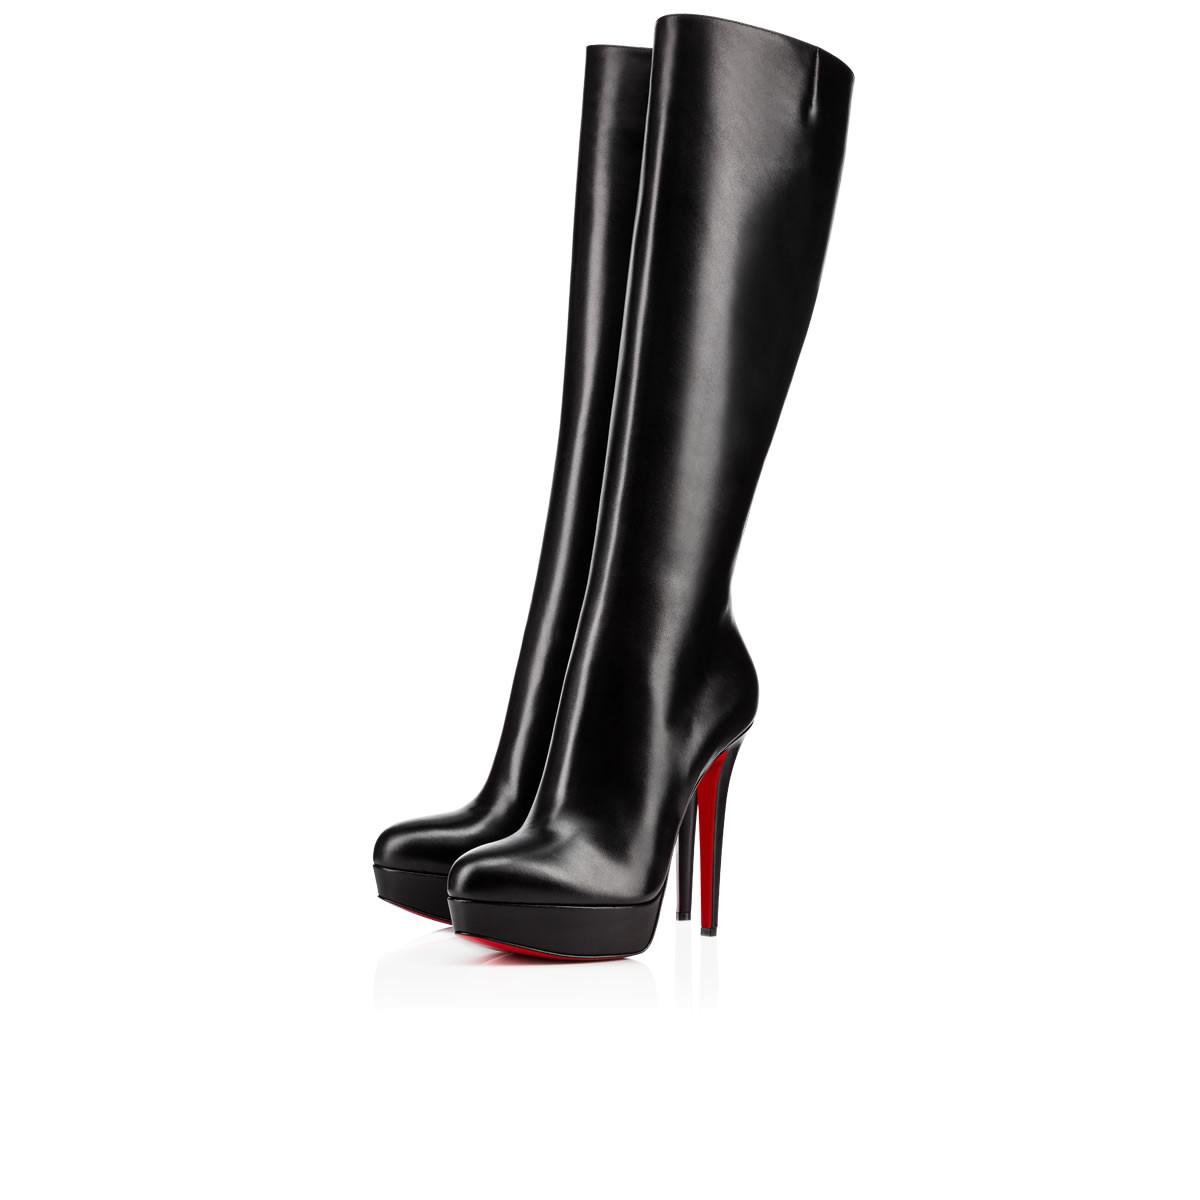 415b1f948255 Christian Louboutin Bianca Botta Platform Red Sole Boot